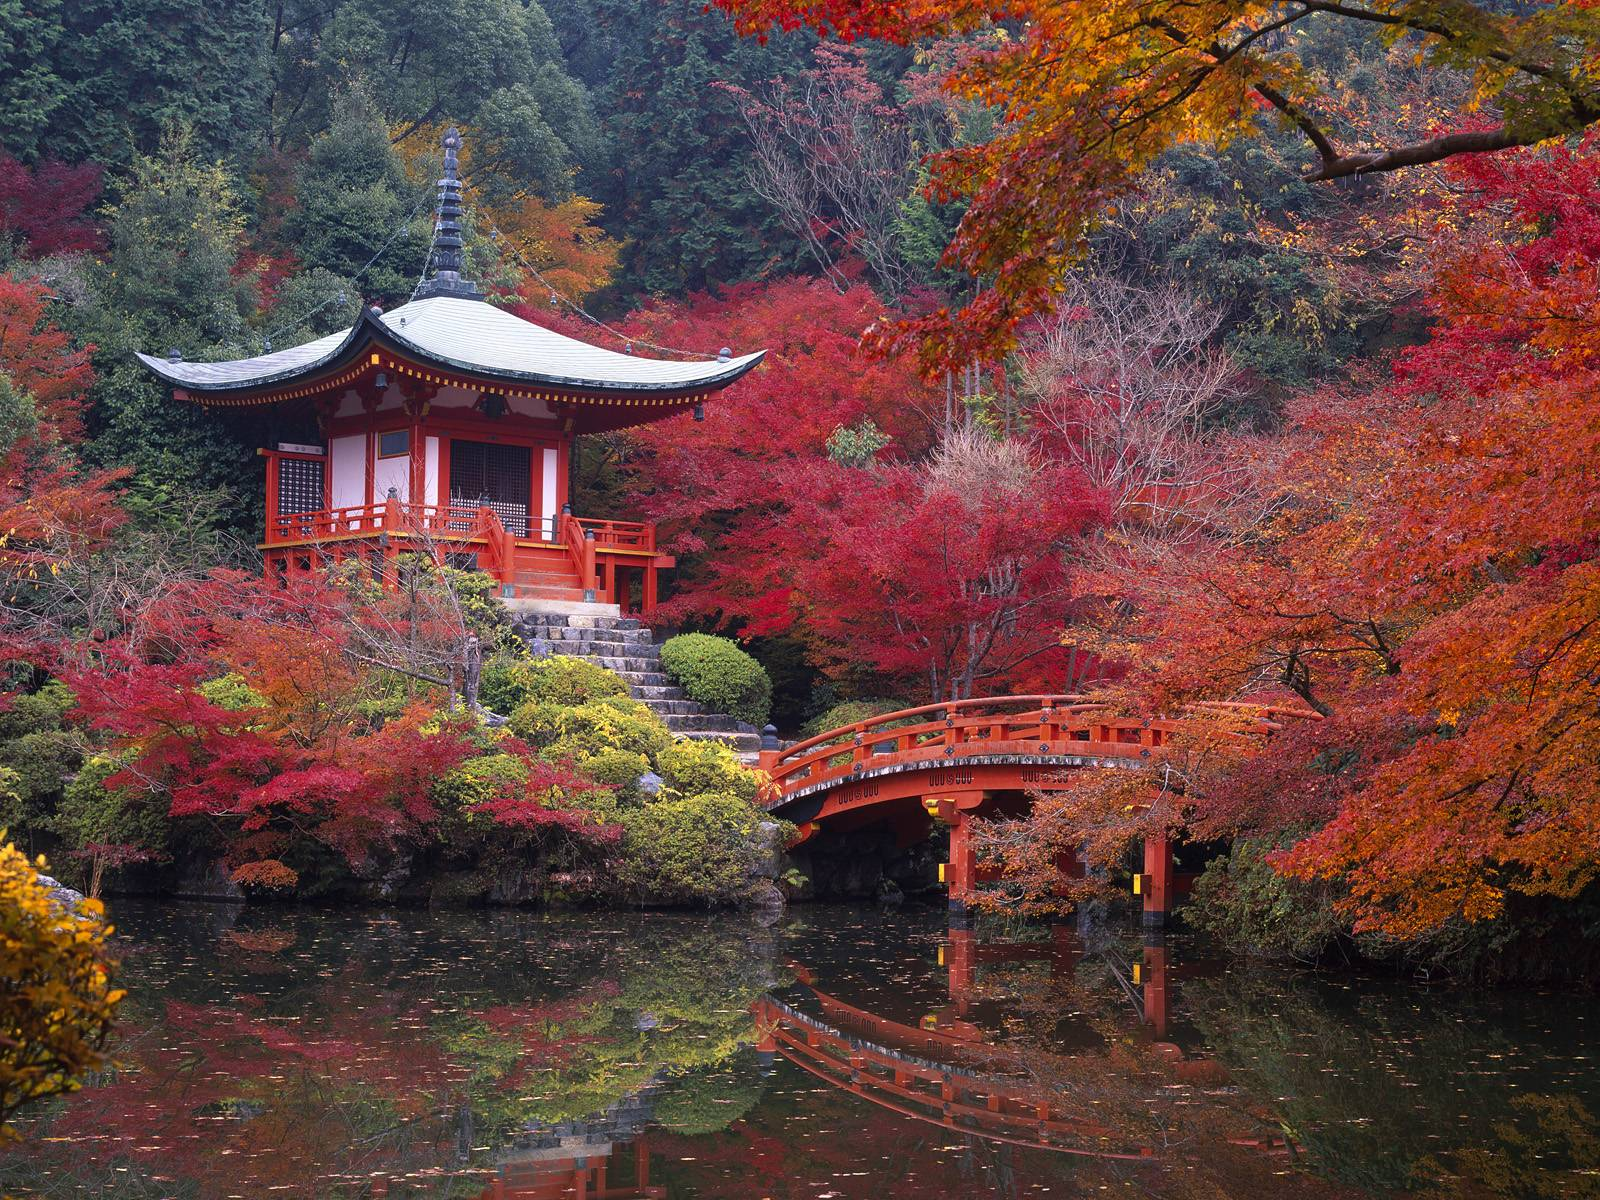 Daigo-ji buddhista templom (Japán)